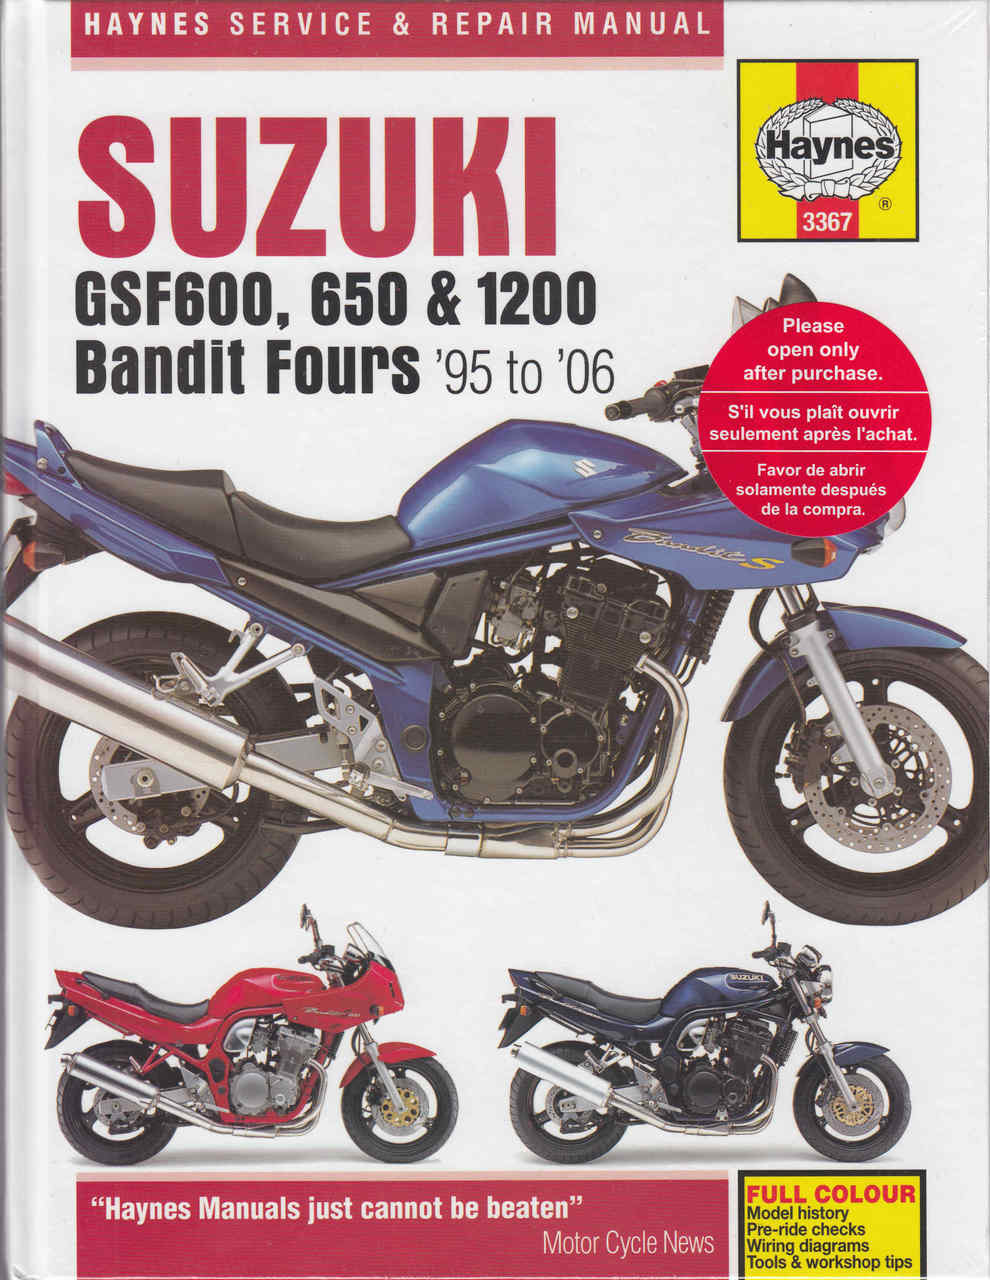 Suzuki GSF600, 650 & 1200 Bandit Fours 1995 to 1996 Service & Repair Manual  ...